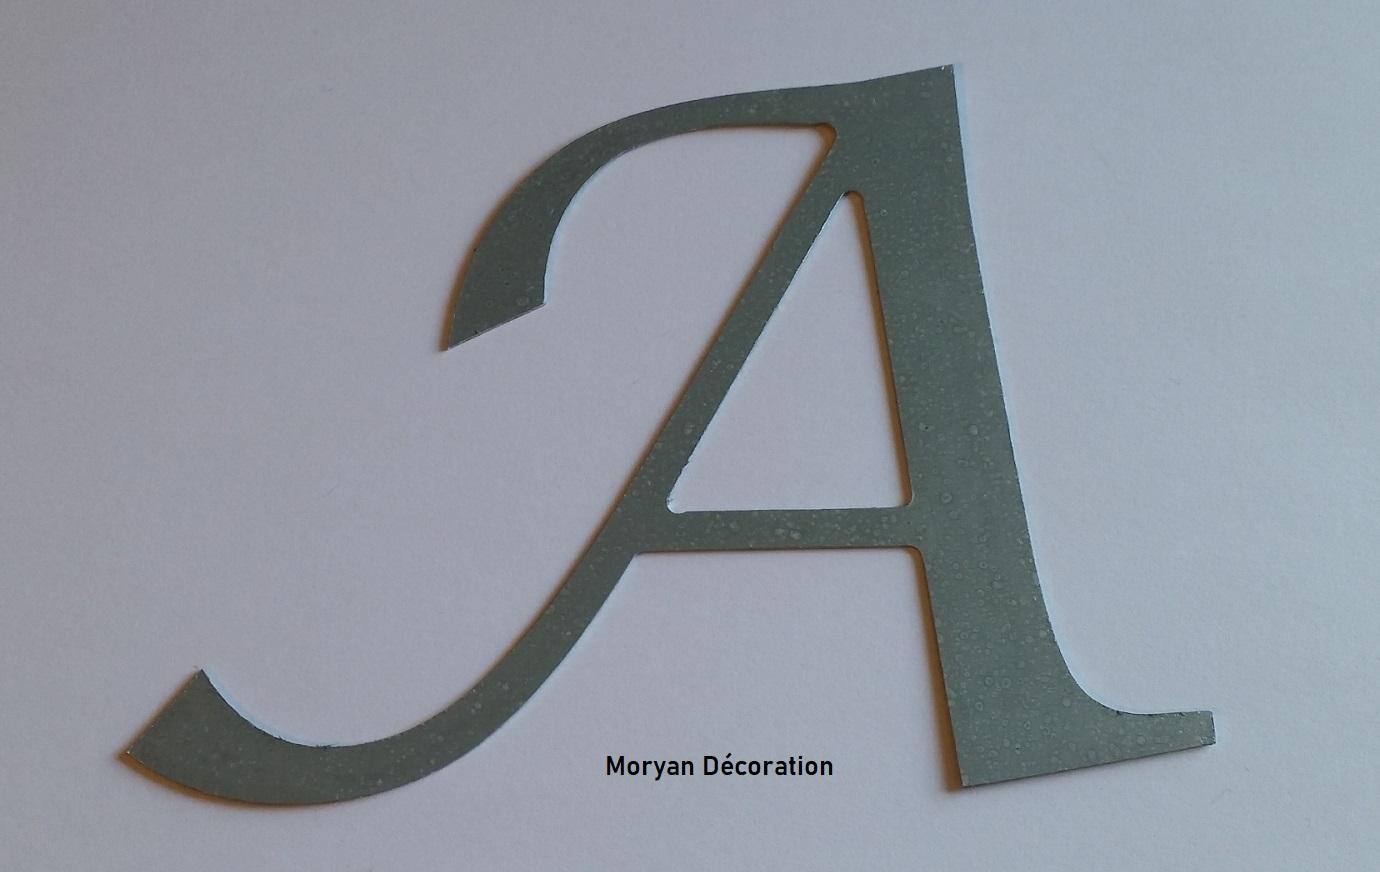 Lettre decorative murale en zinc lucida calligraphy